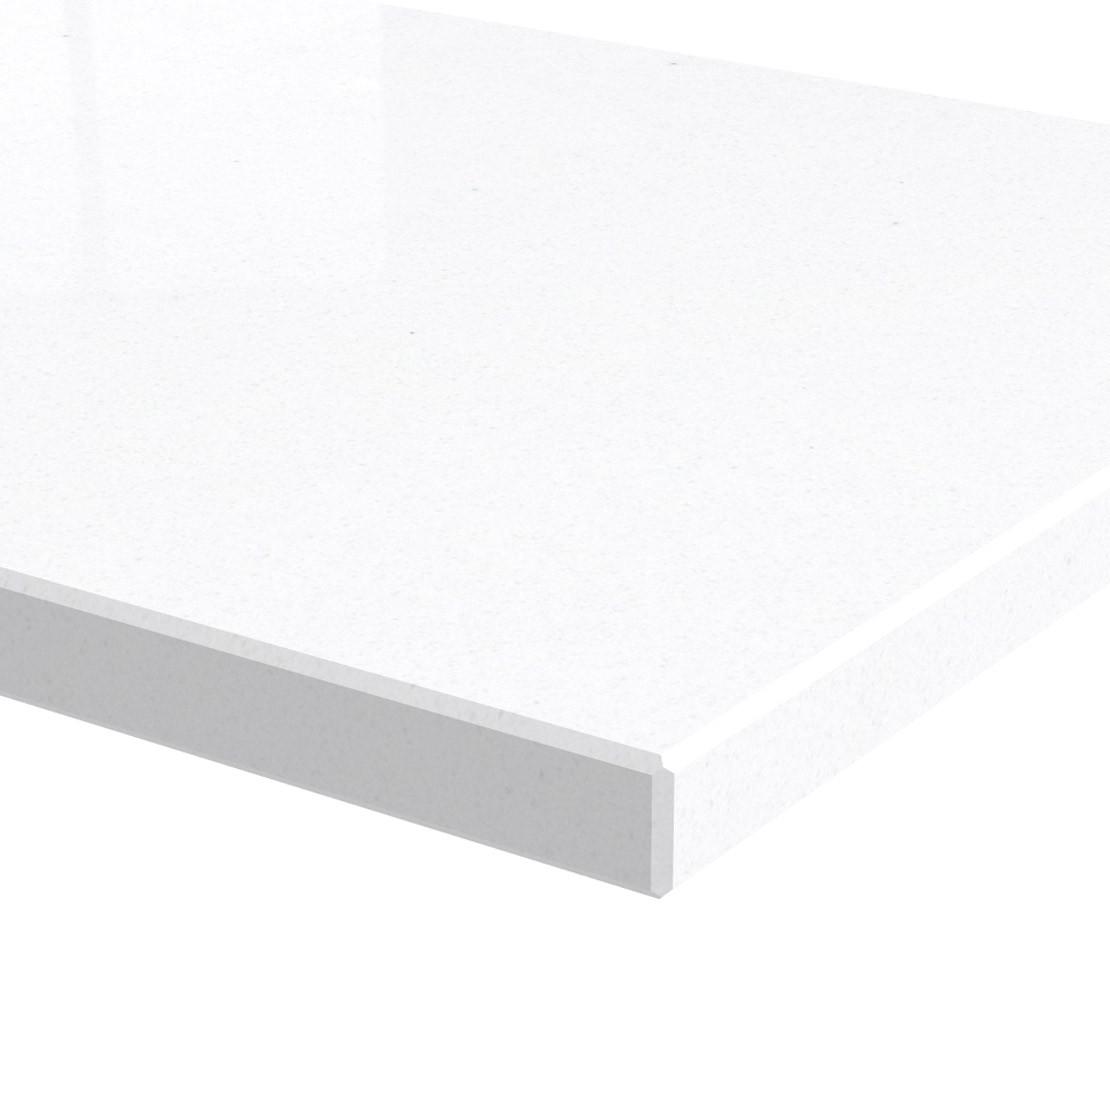 Blad 20mm dik Pure White kwartscomposiet (velvet)